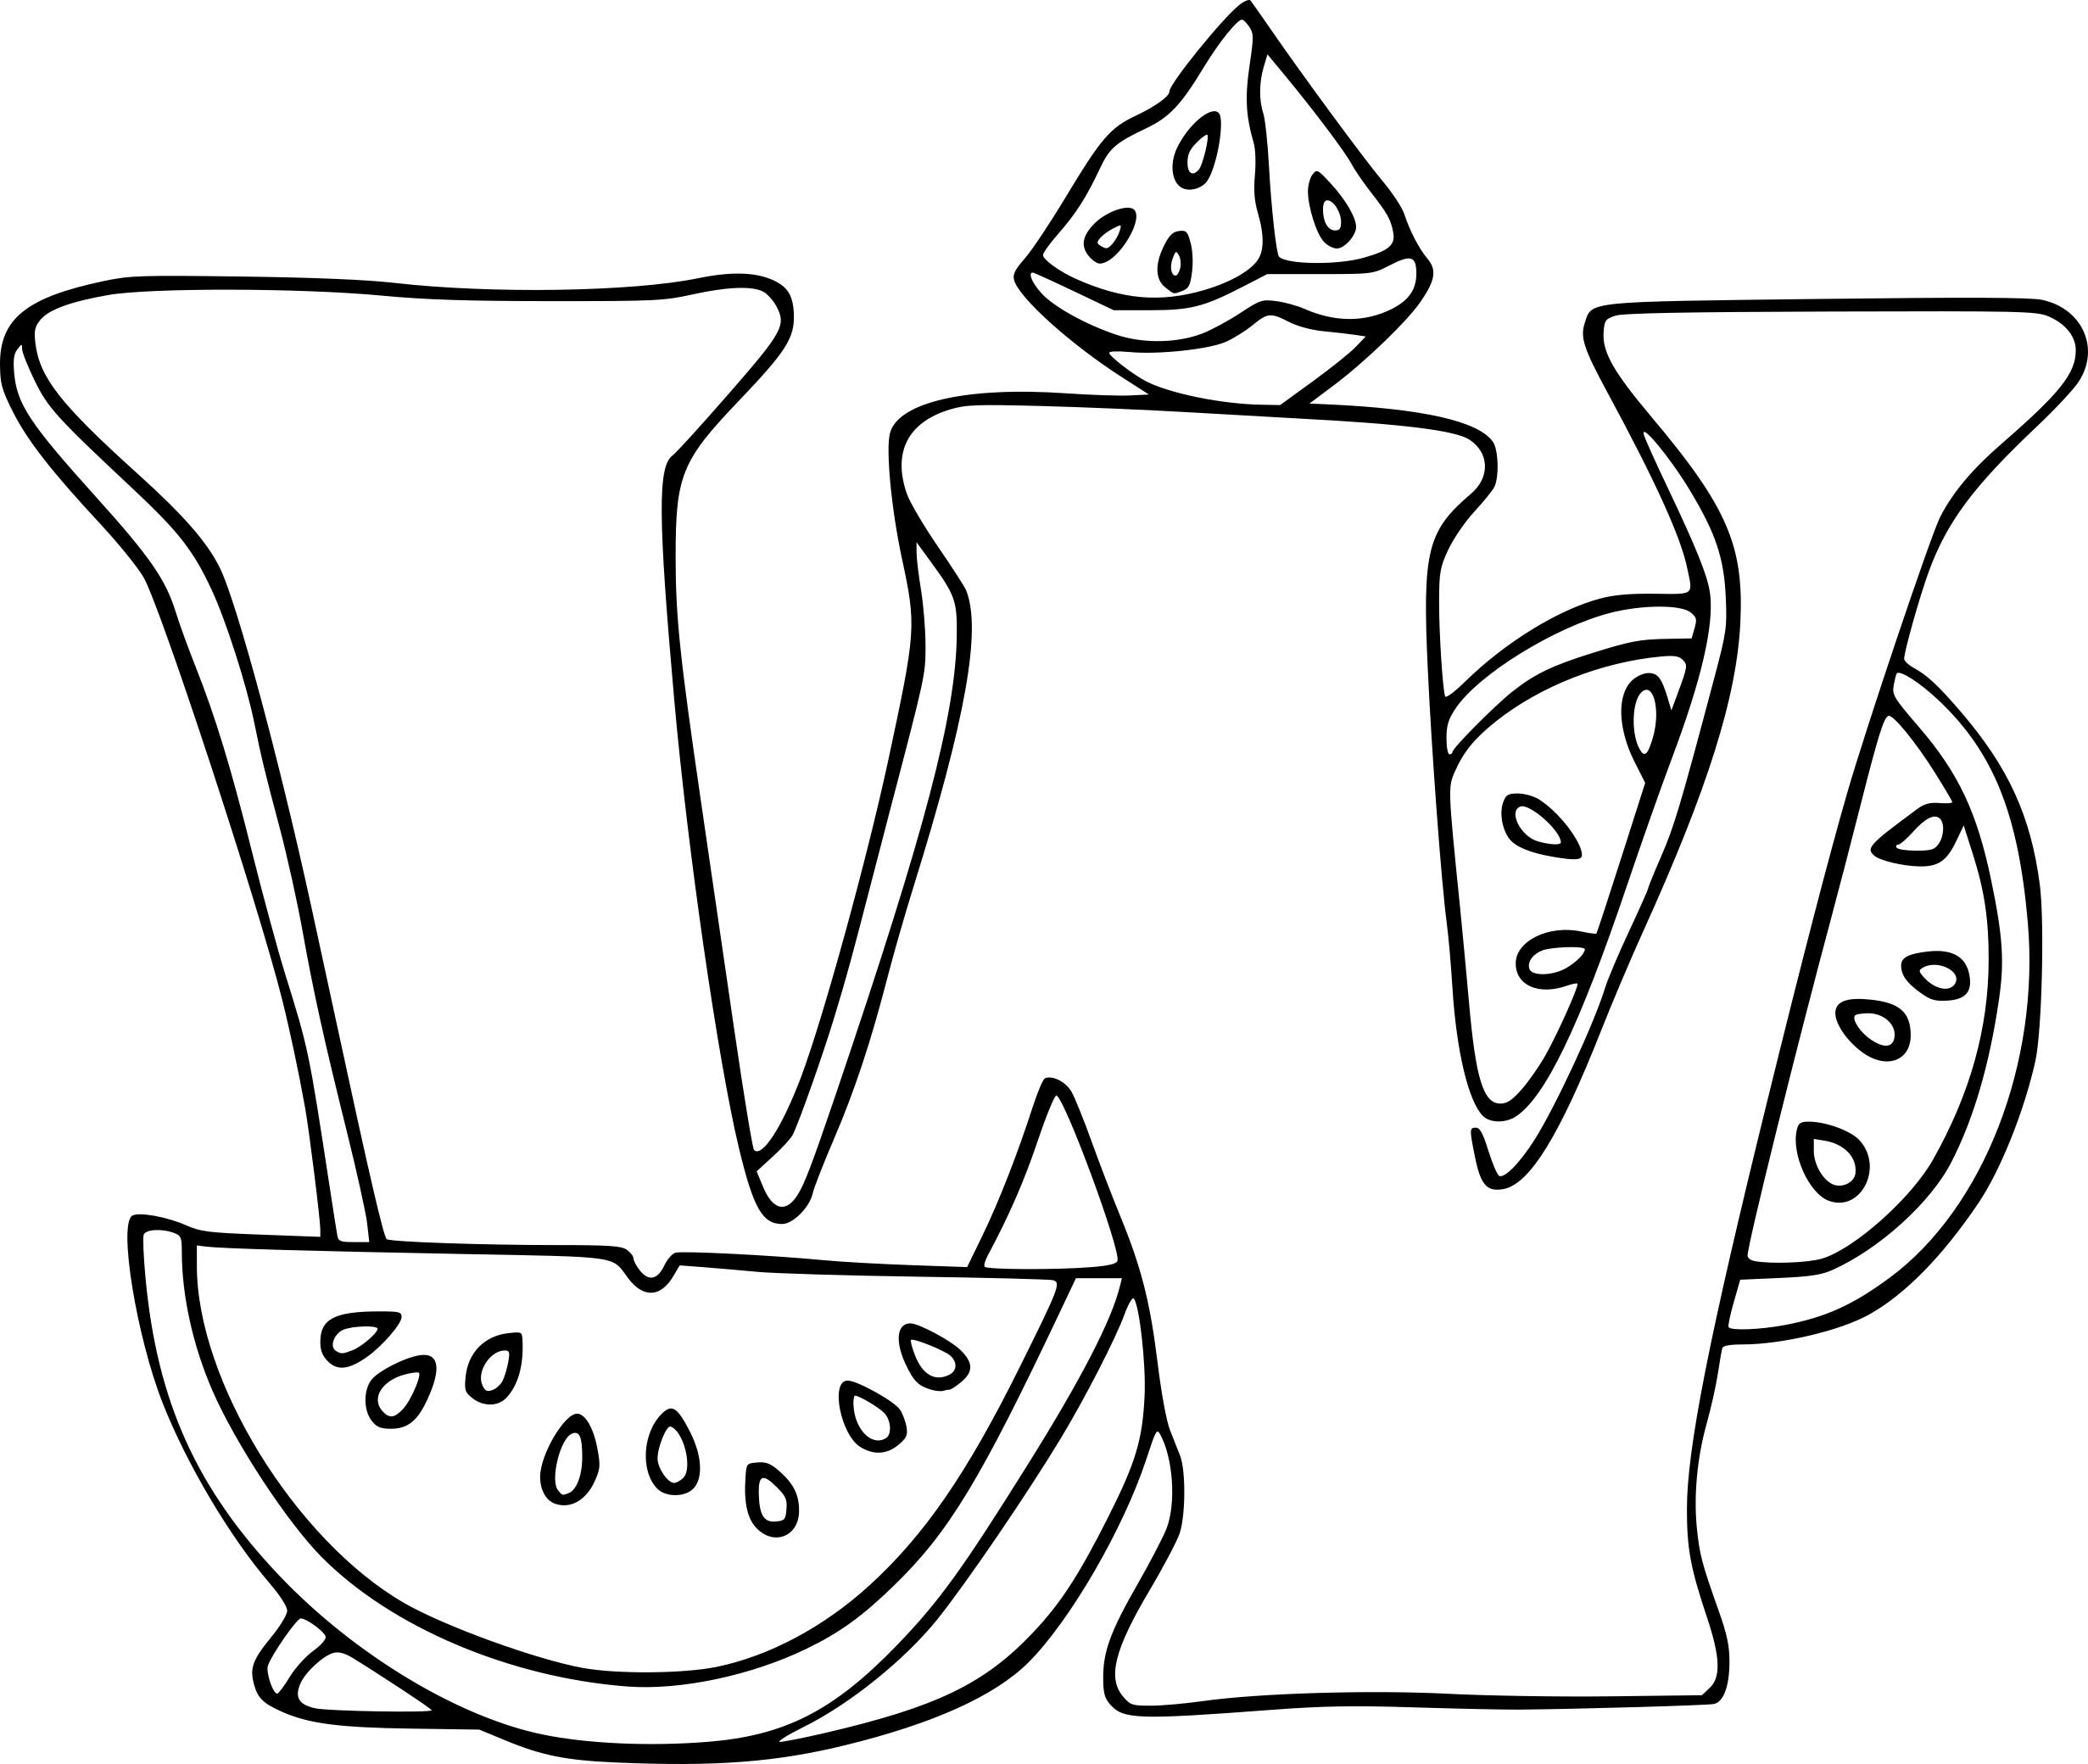 Coloriage lettre W